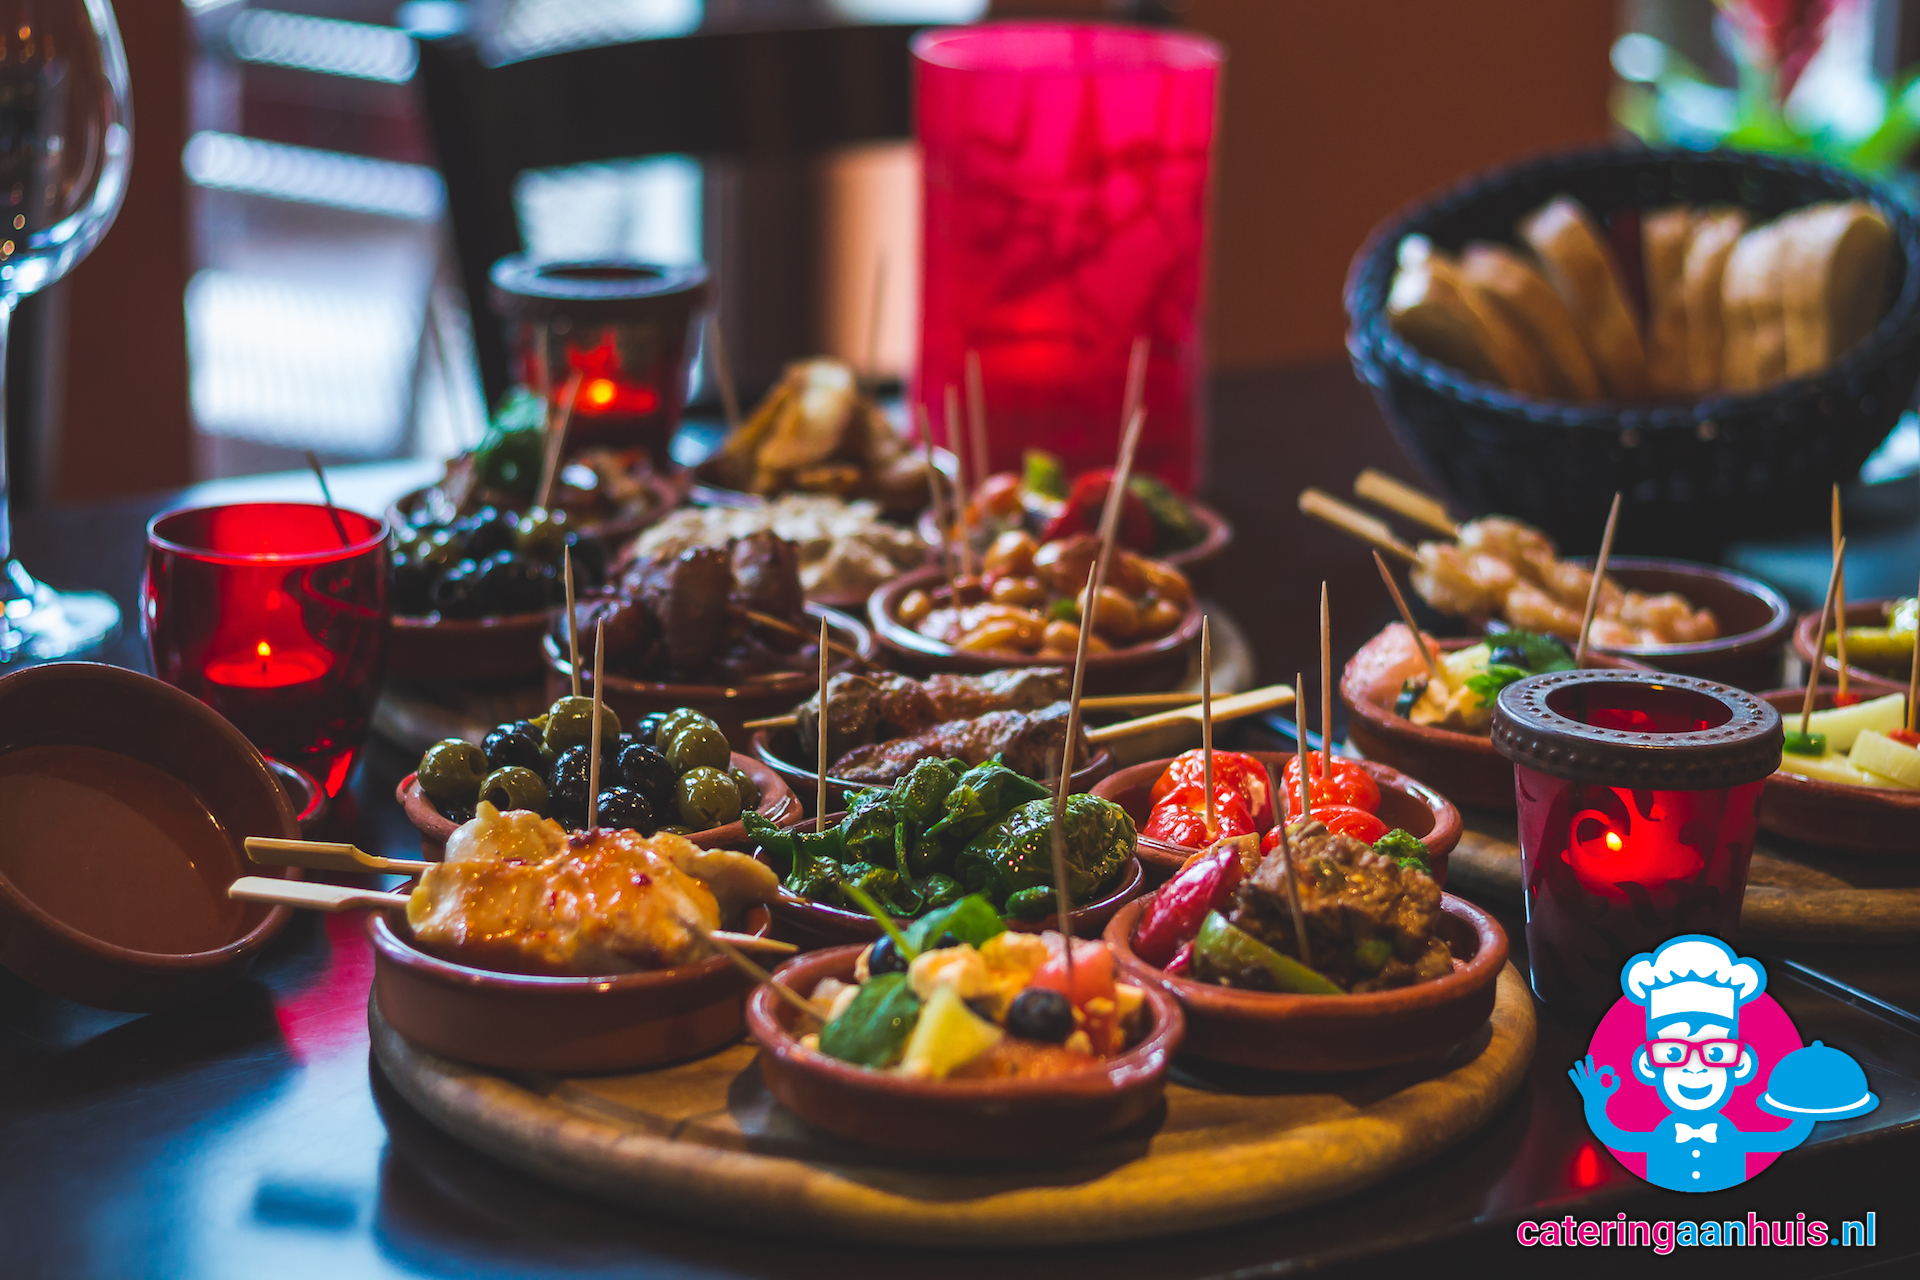 Wonderbaar Tapas buffet ⋆ Catering aan huis ⋆ Catering Aan Huis .NL ZX-61